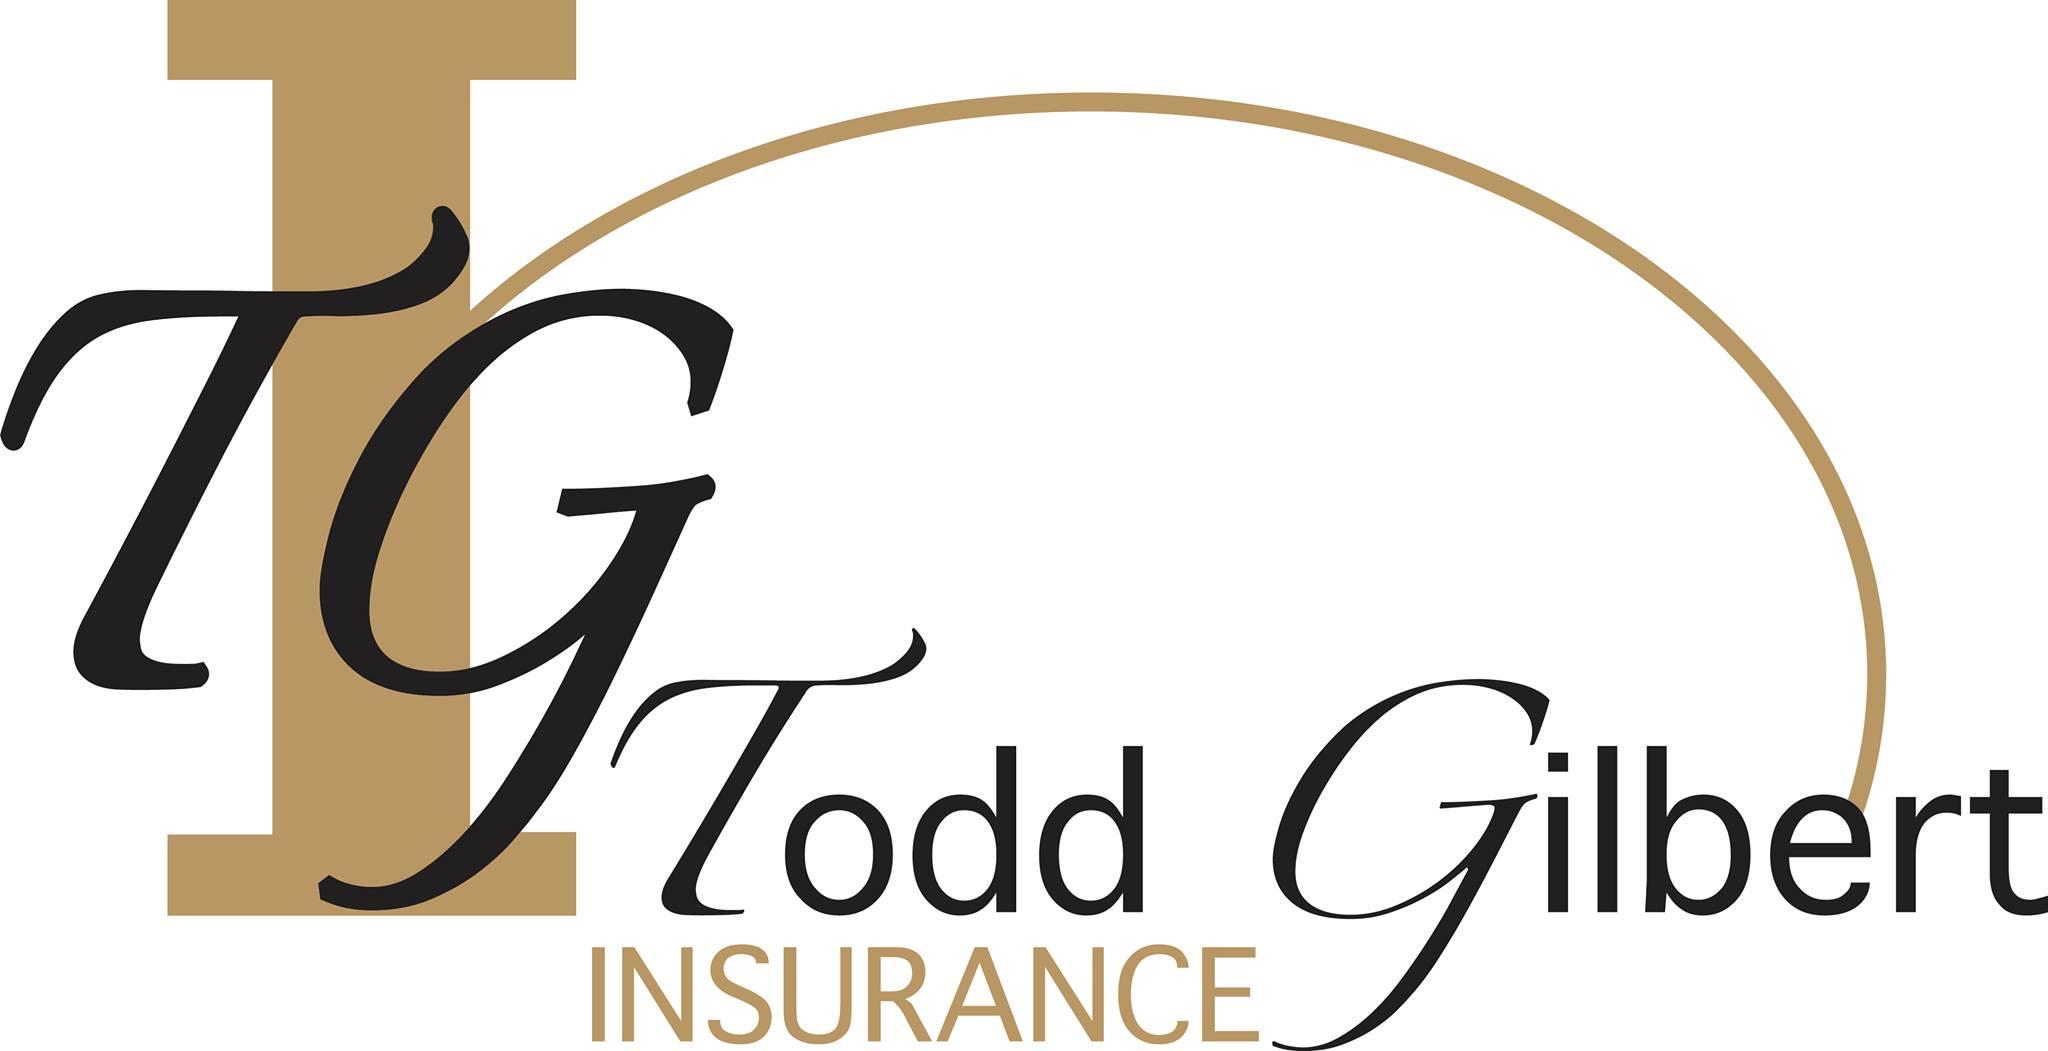 Todd Gilbert Insurance Agency